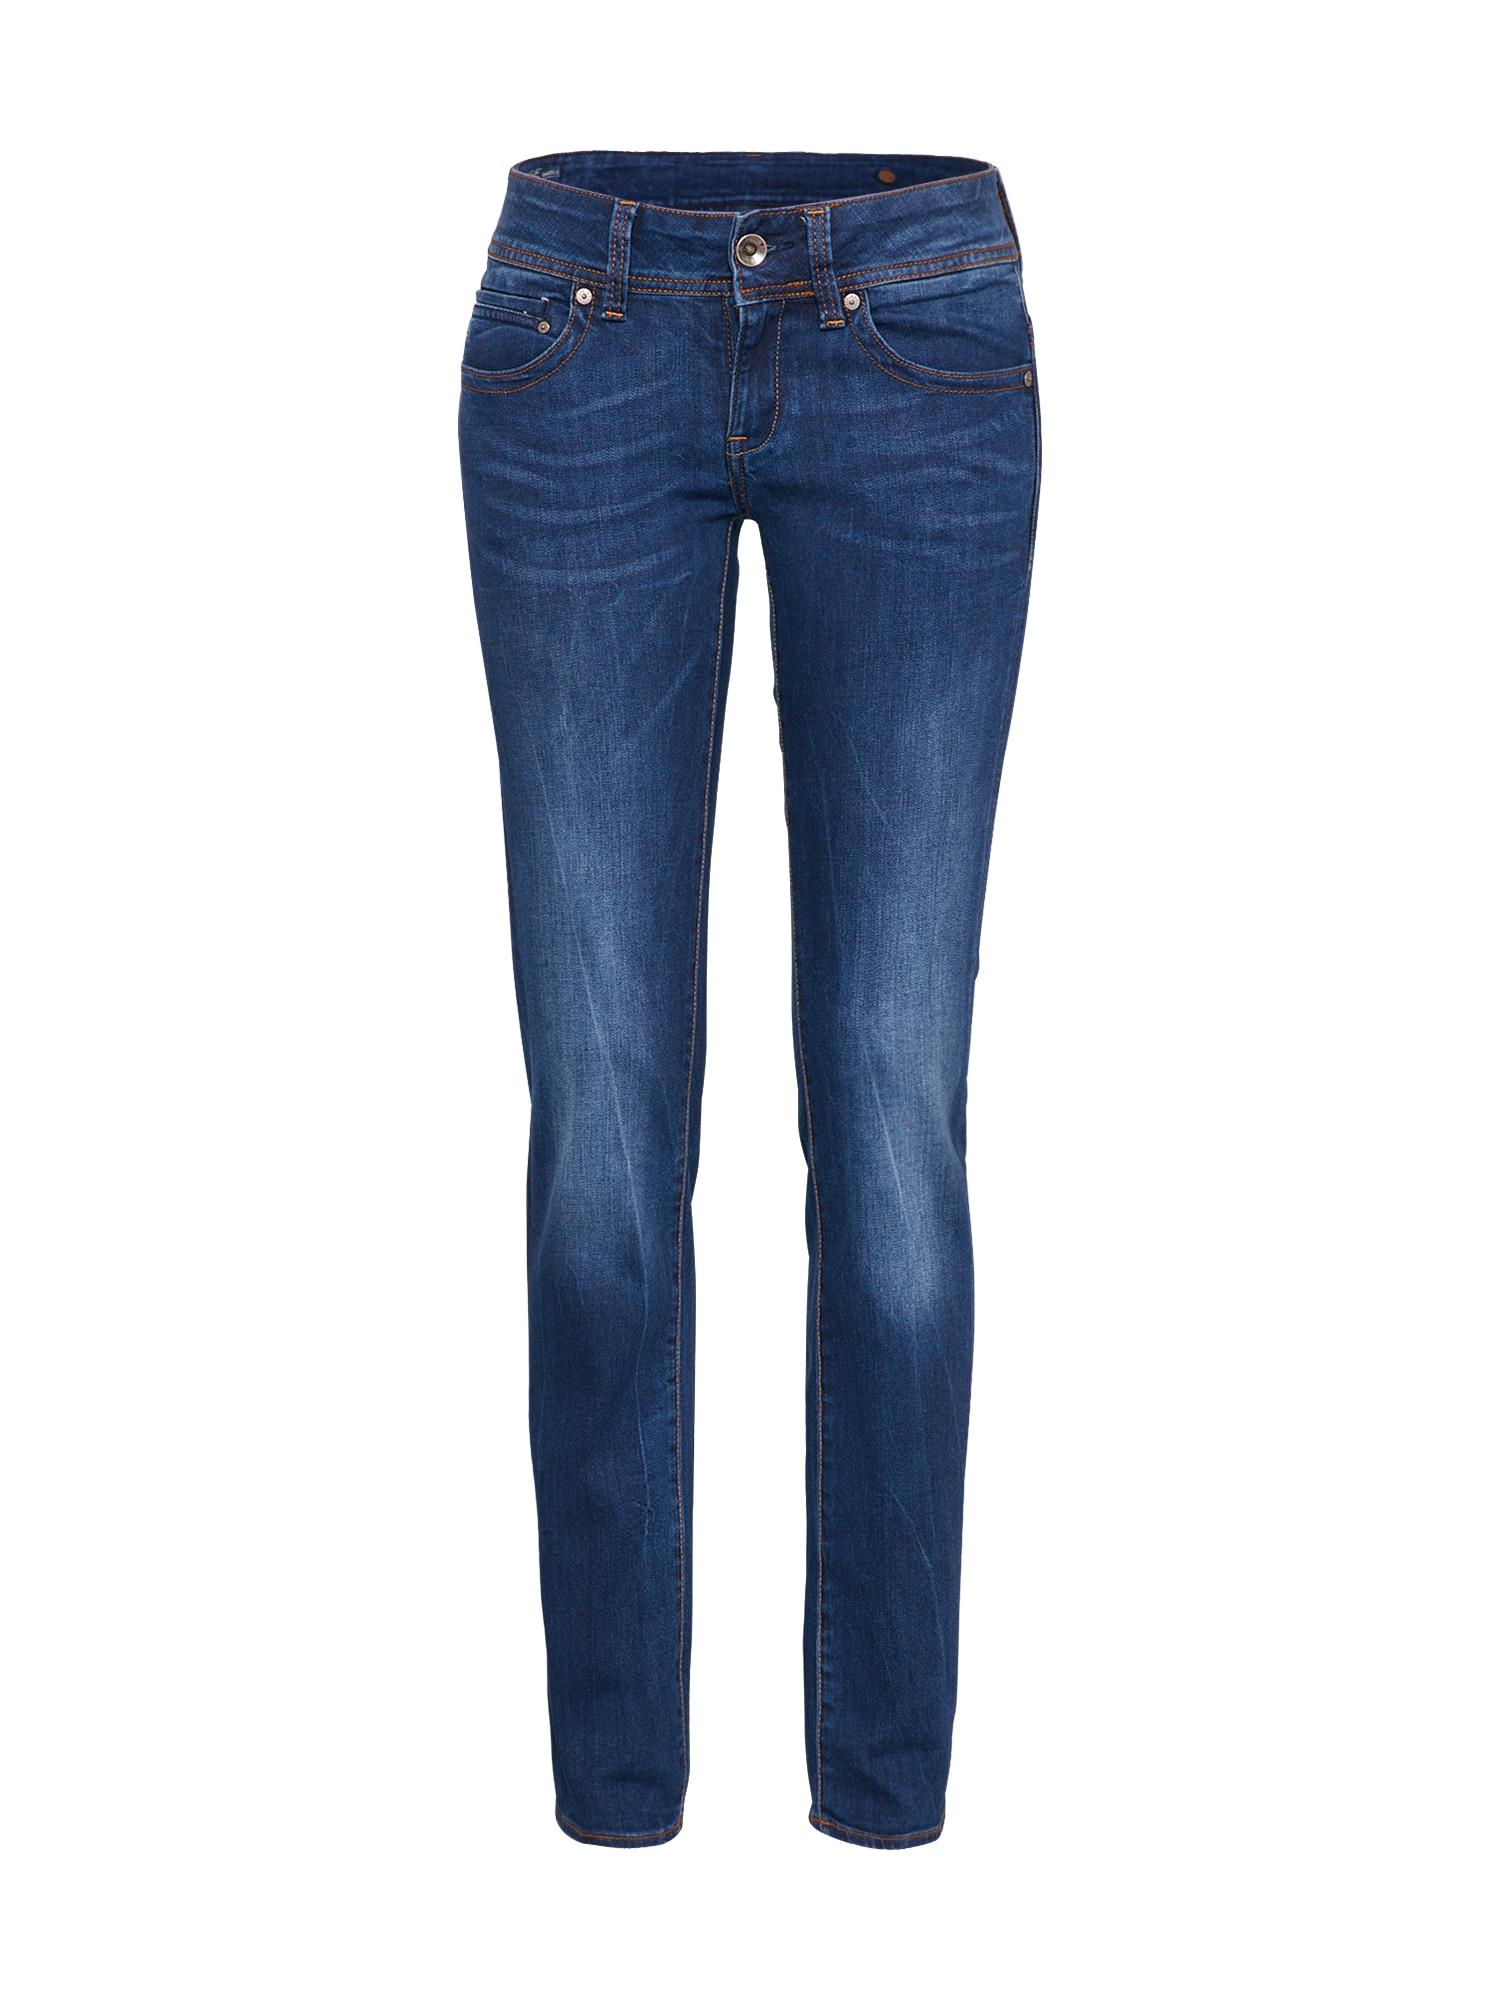 G-STAR RAW Dames Jeans Midge Saddle Mid Straight blue denim